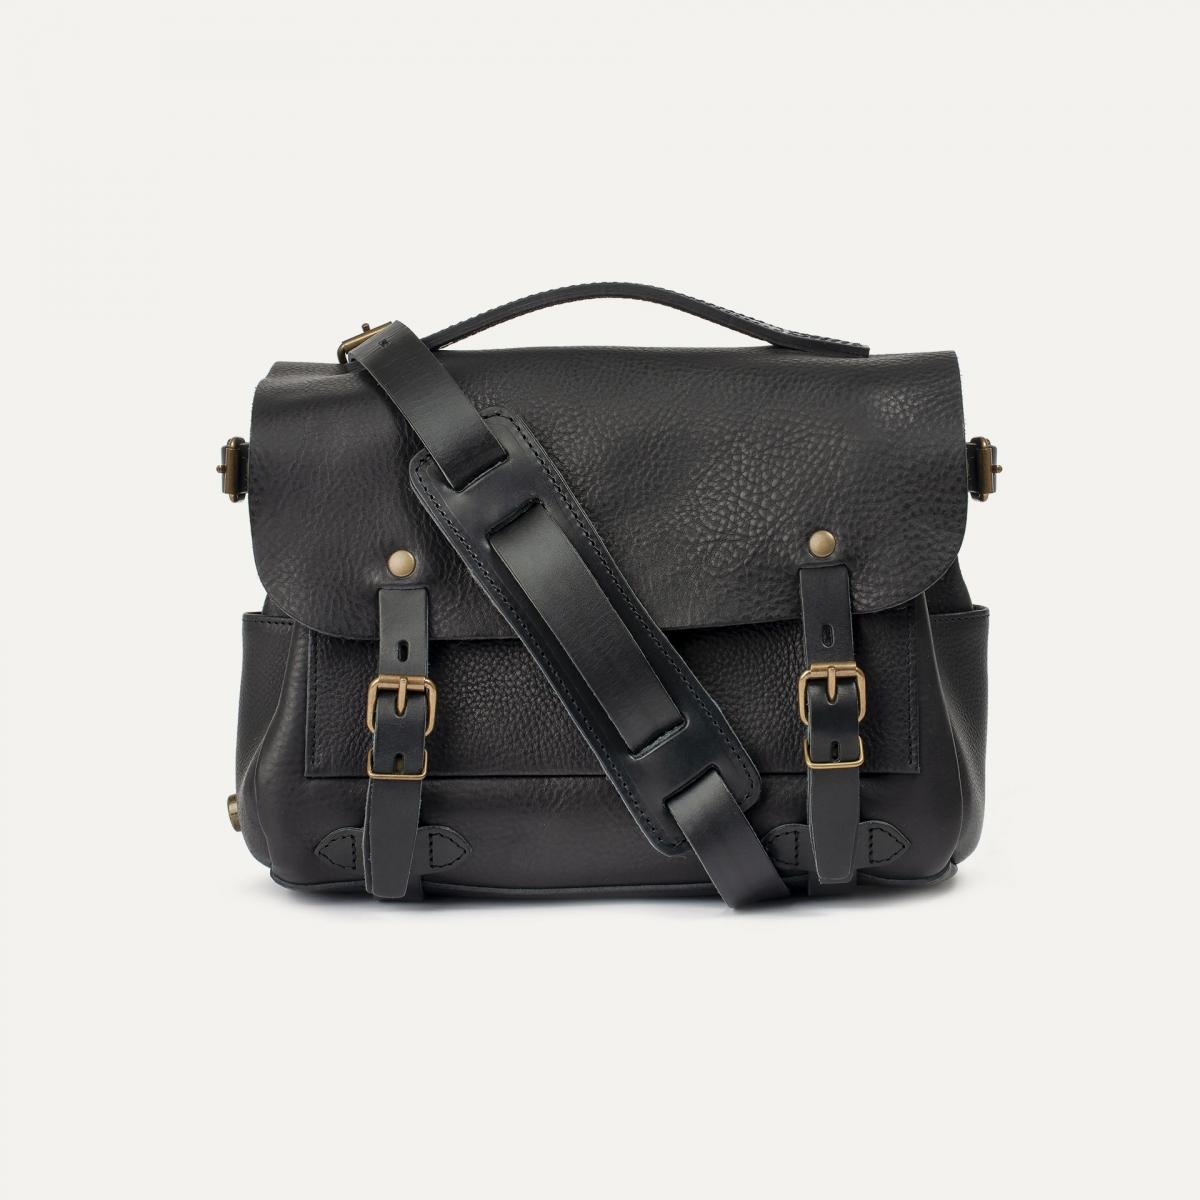 Postman bag Éclair S - Black (image n°1)